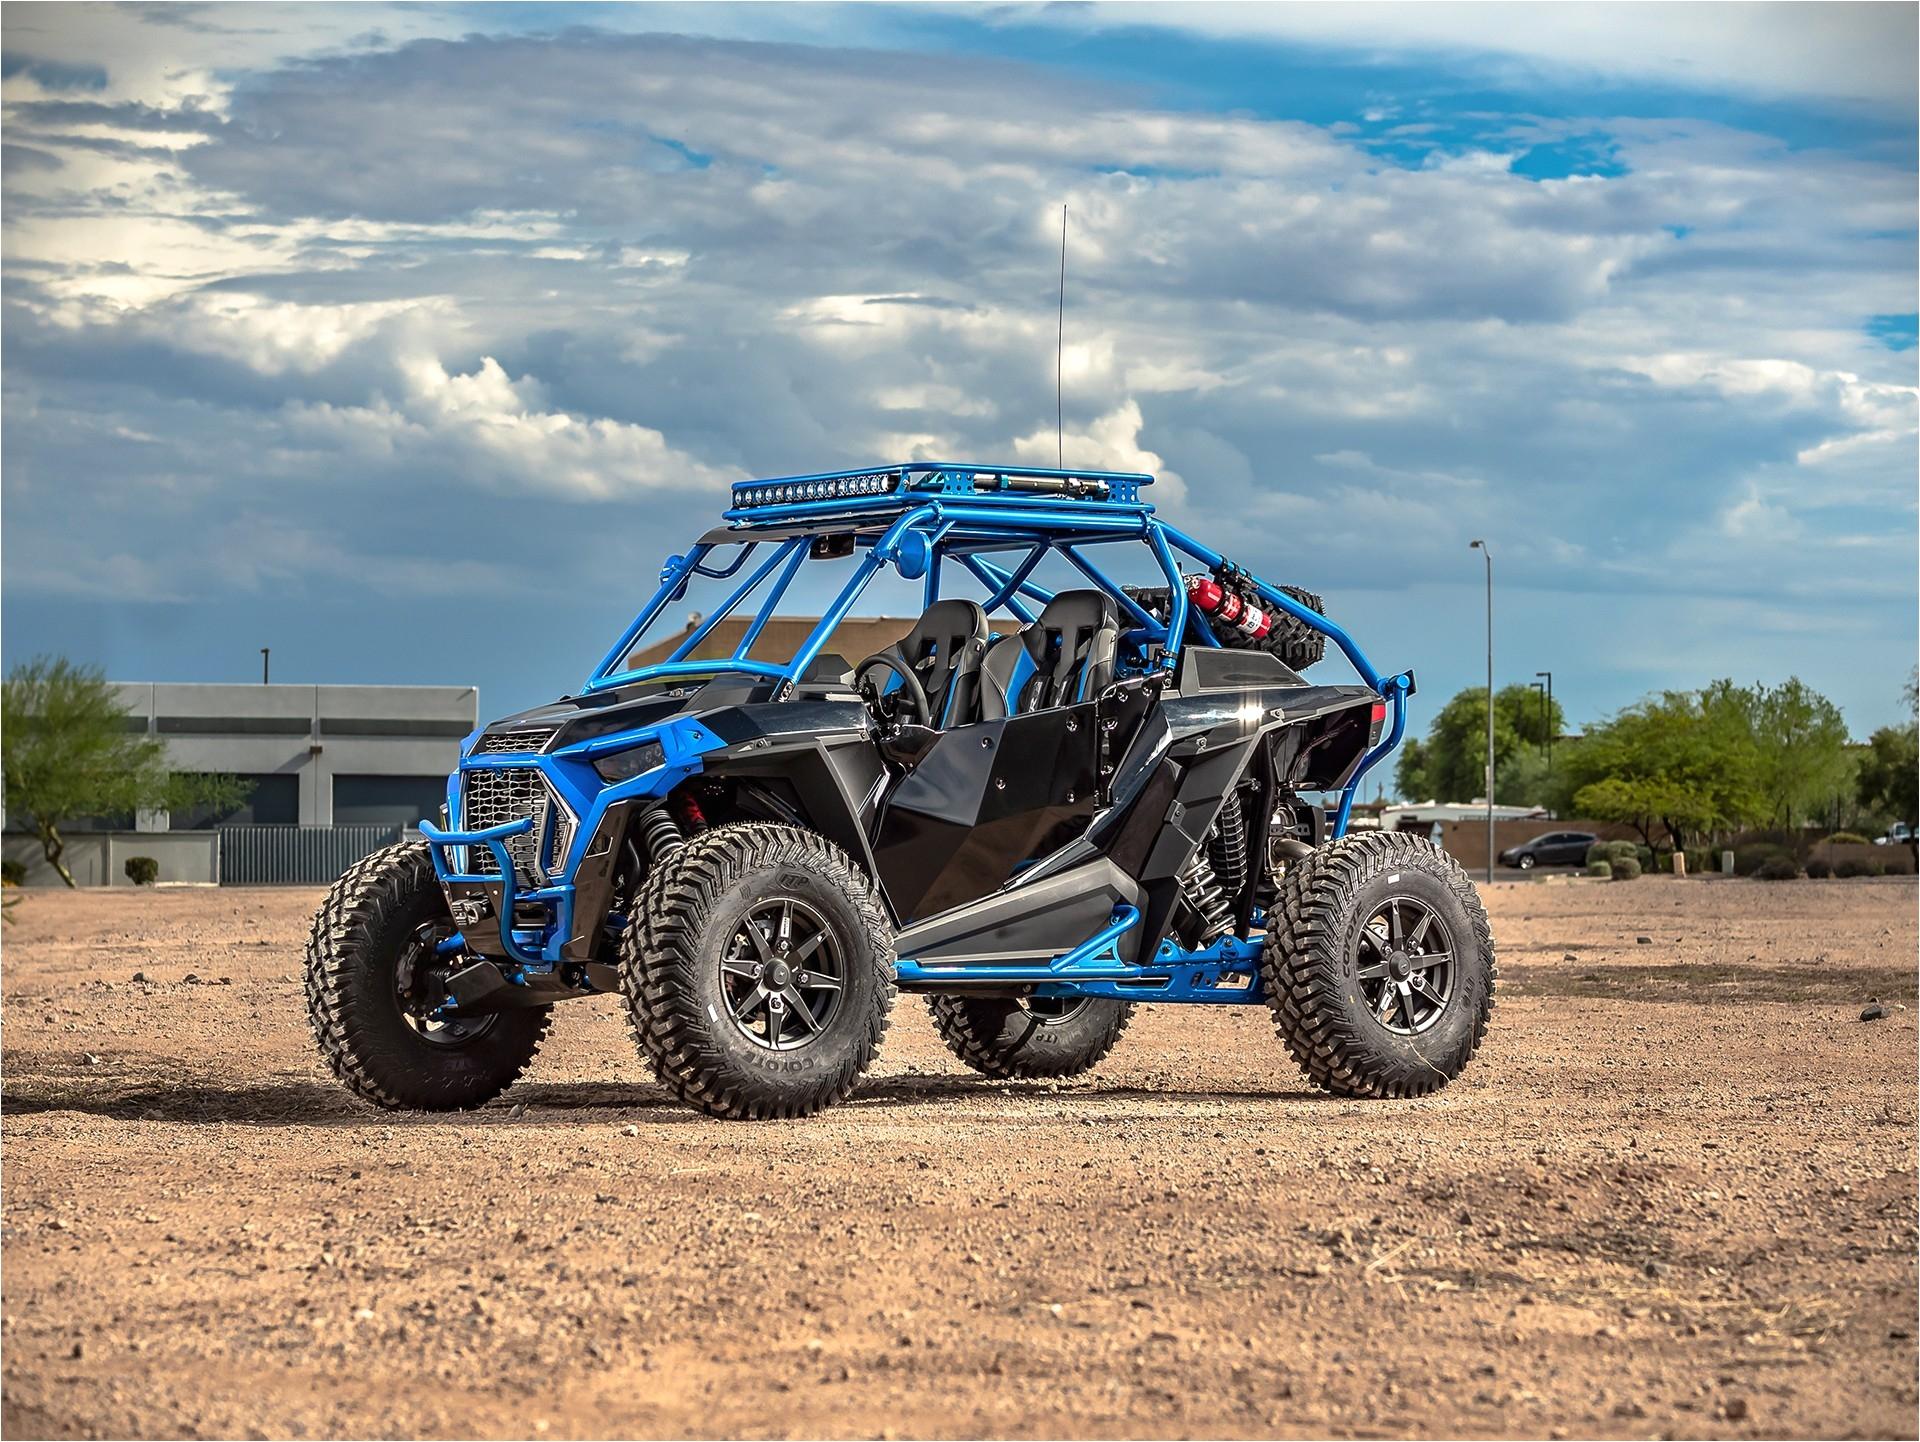 steve xp turbo s build 01